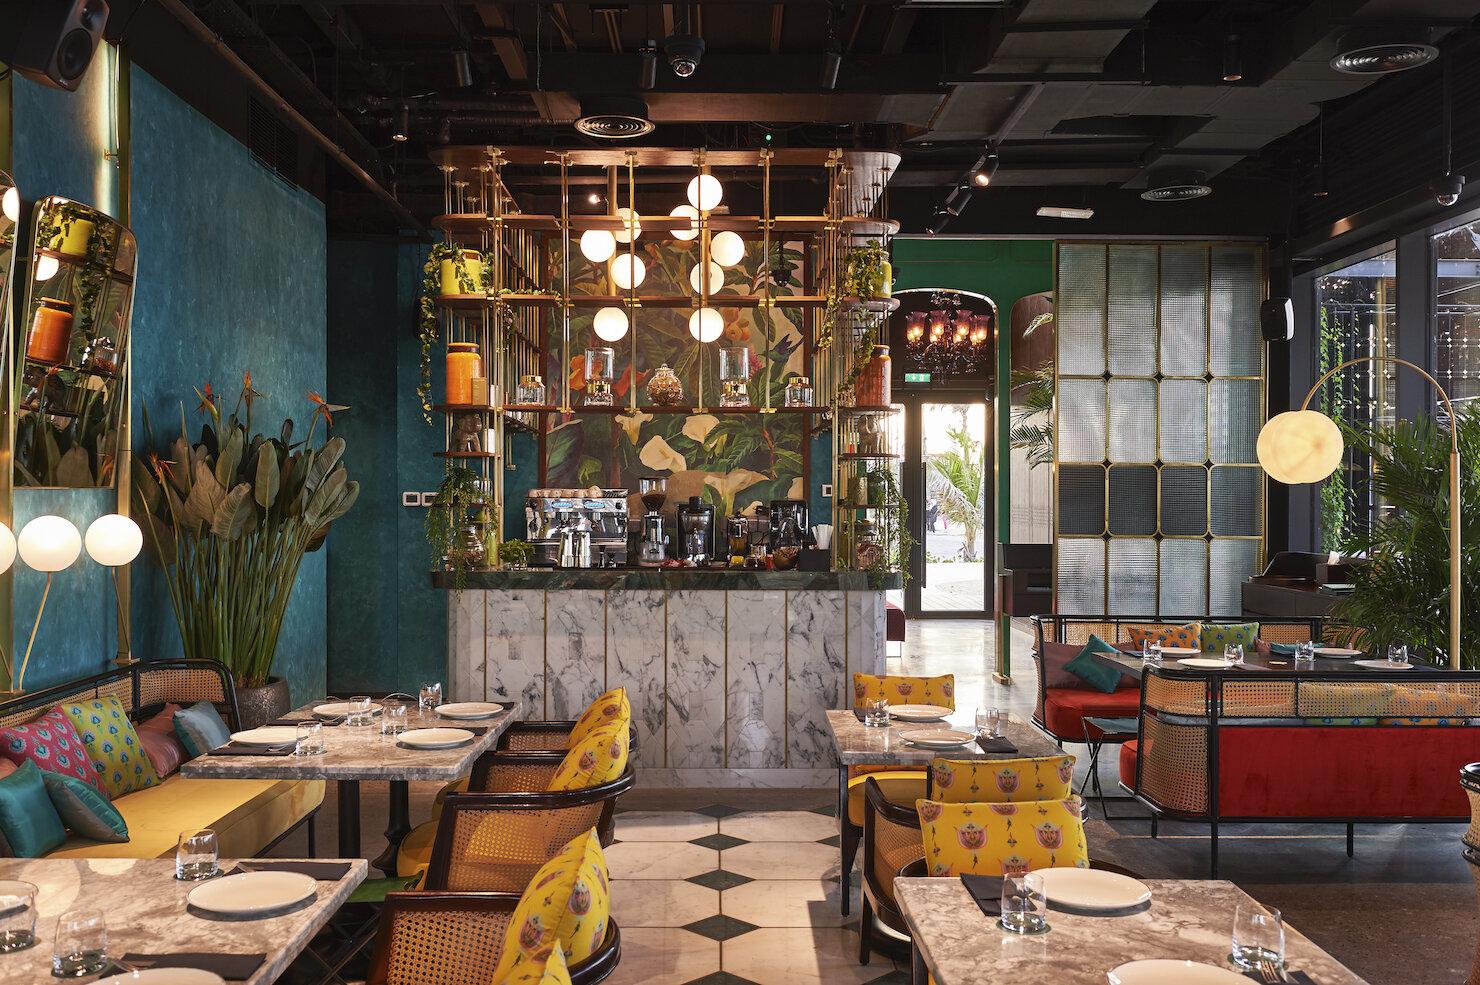 Studio Lotus_Masti Cocktails & Cuisine - Project Images_6 (IC – Juliet Dunne).jpg